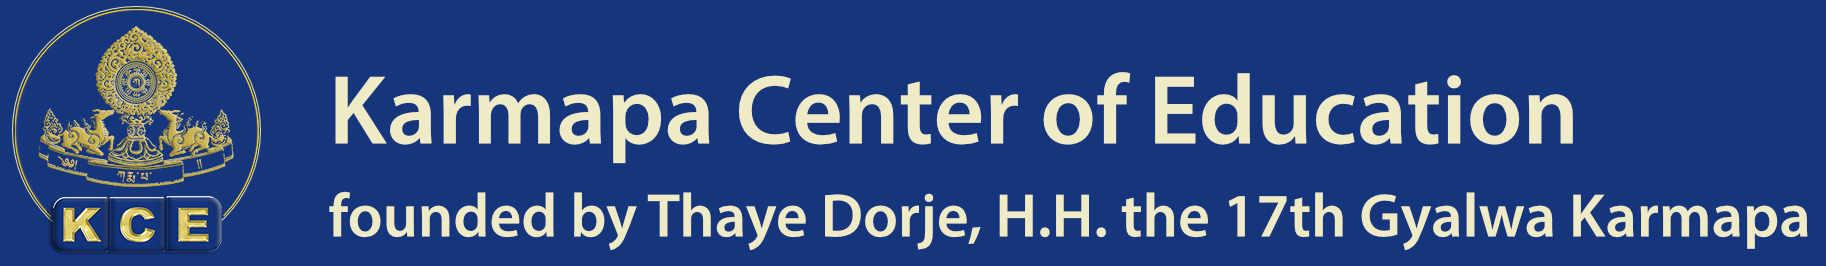 Karmapa Center of Education (KCE), a Buddhist model school founded by Thaye Dorje, H.H. the 17th Gyalwa Karmapa